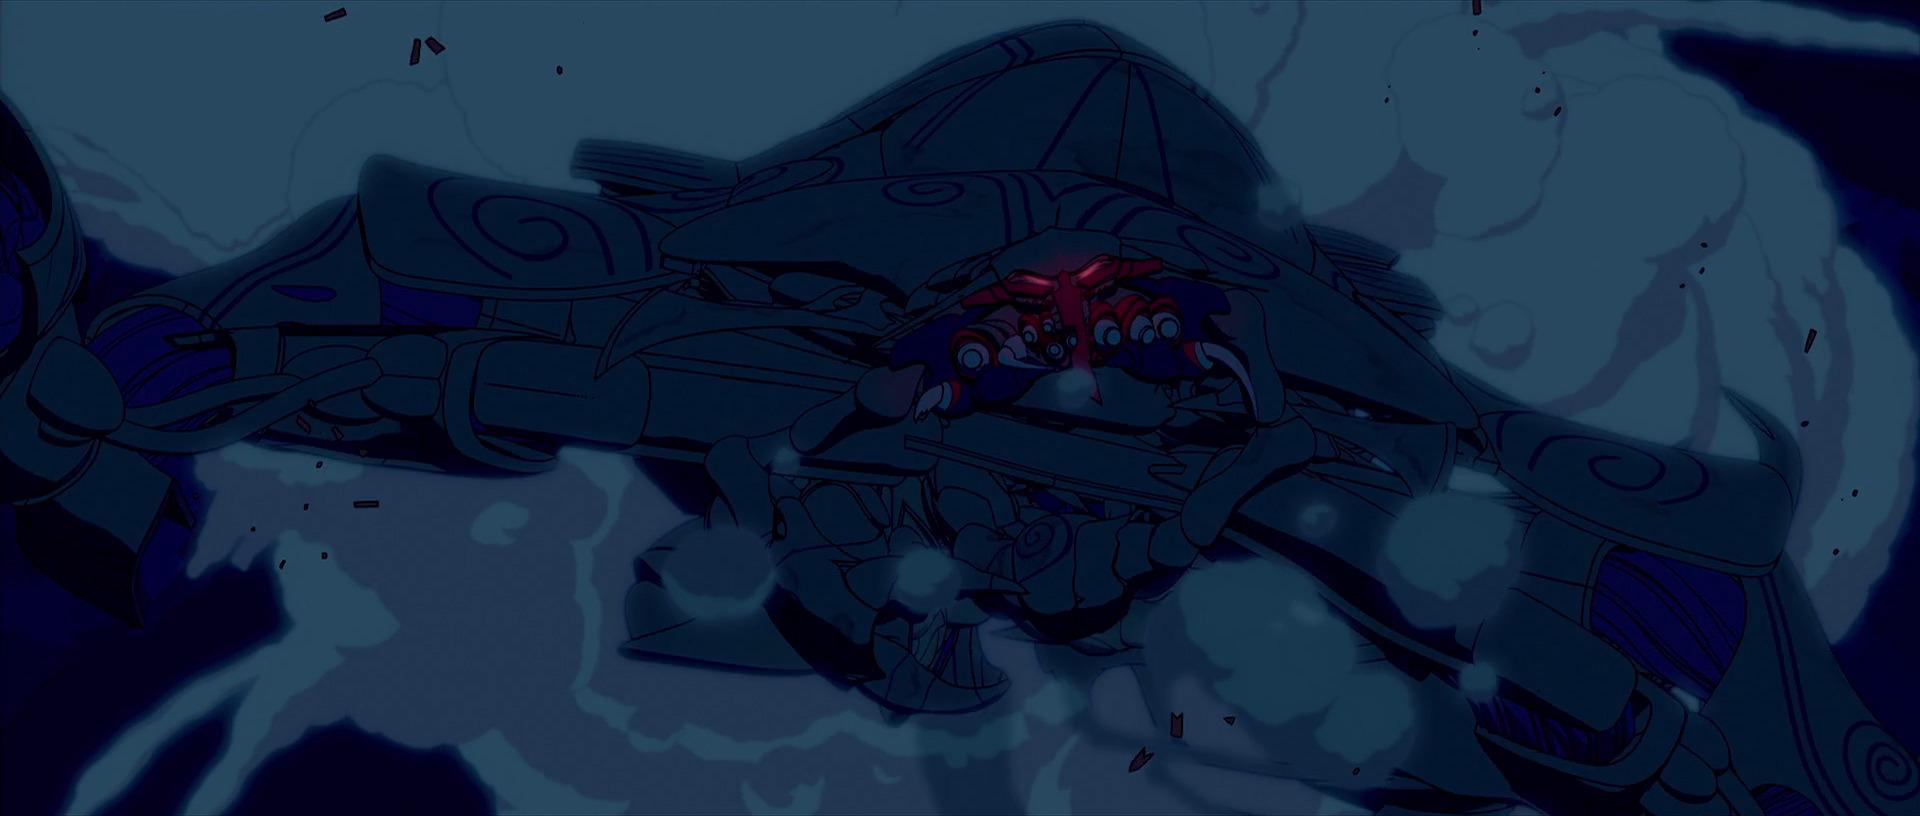 Disneys Atlantis The Villains: Atlantean Leviathan Vs Reaper Destroyer